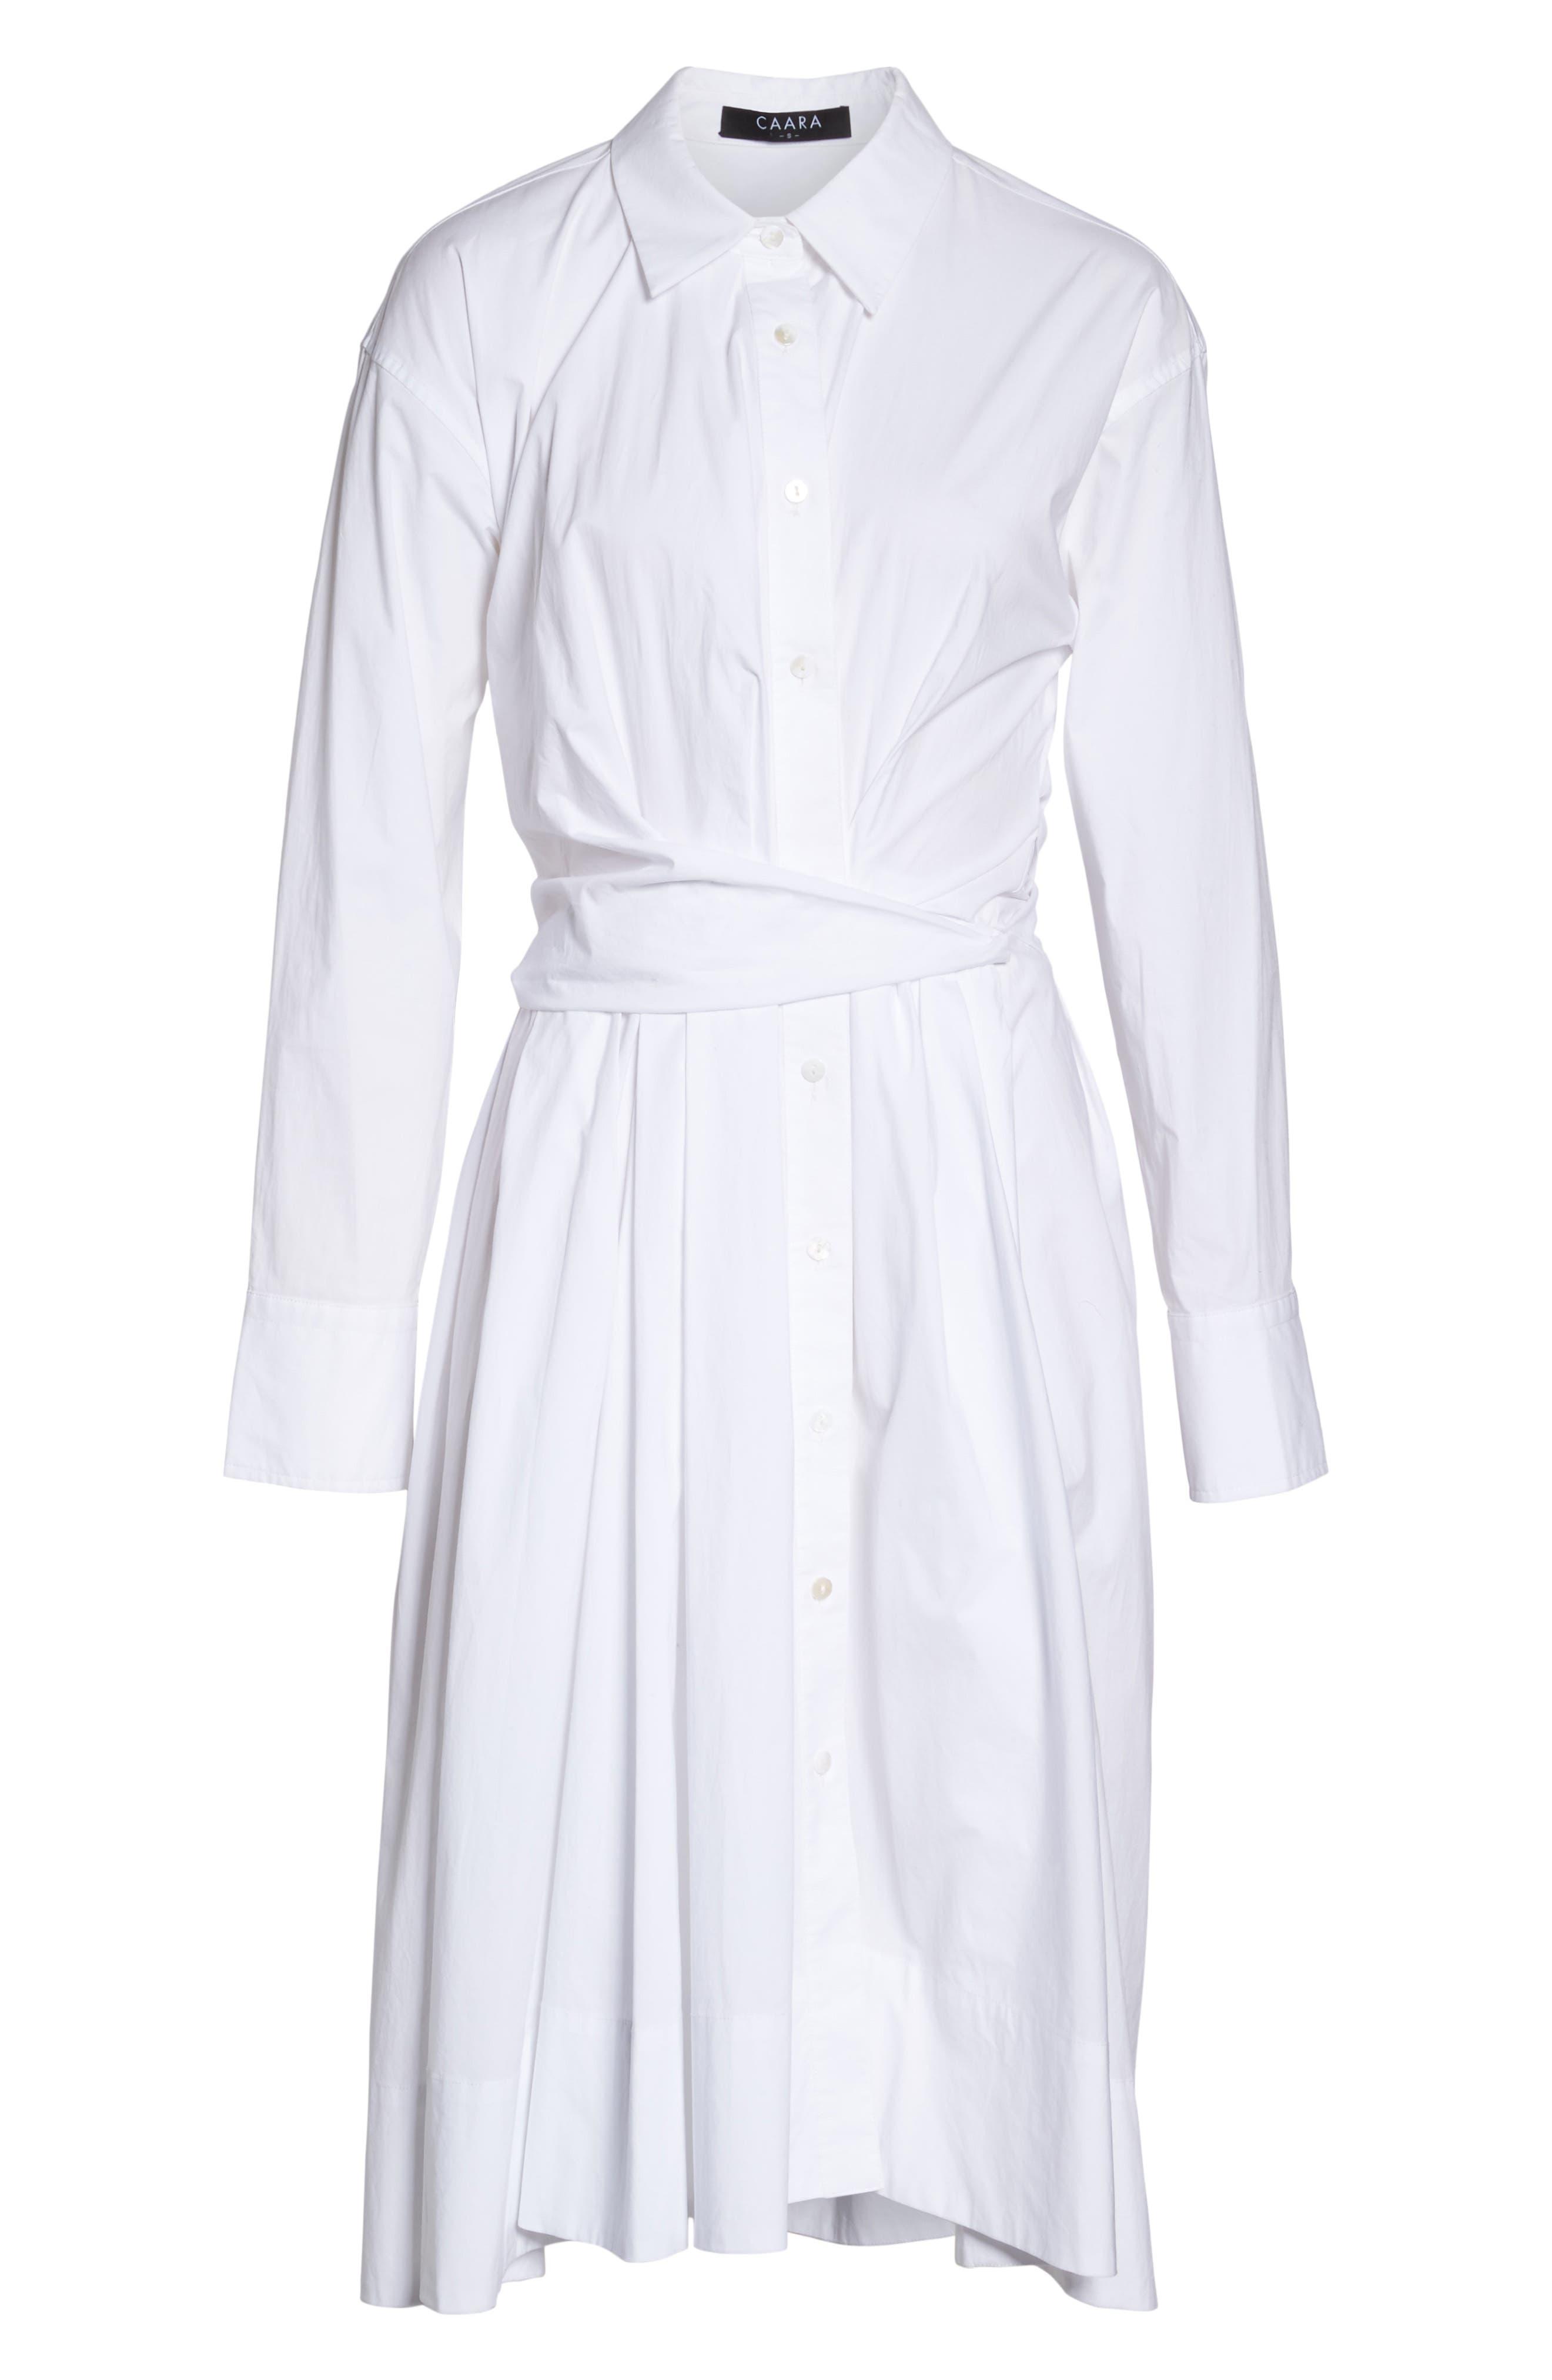 Tiffany Cotton Shirtdress,                             Alternate thumbnail 6, color,